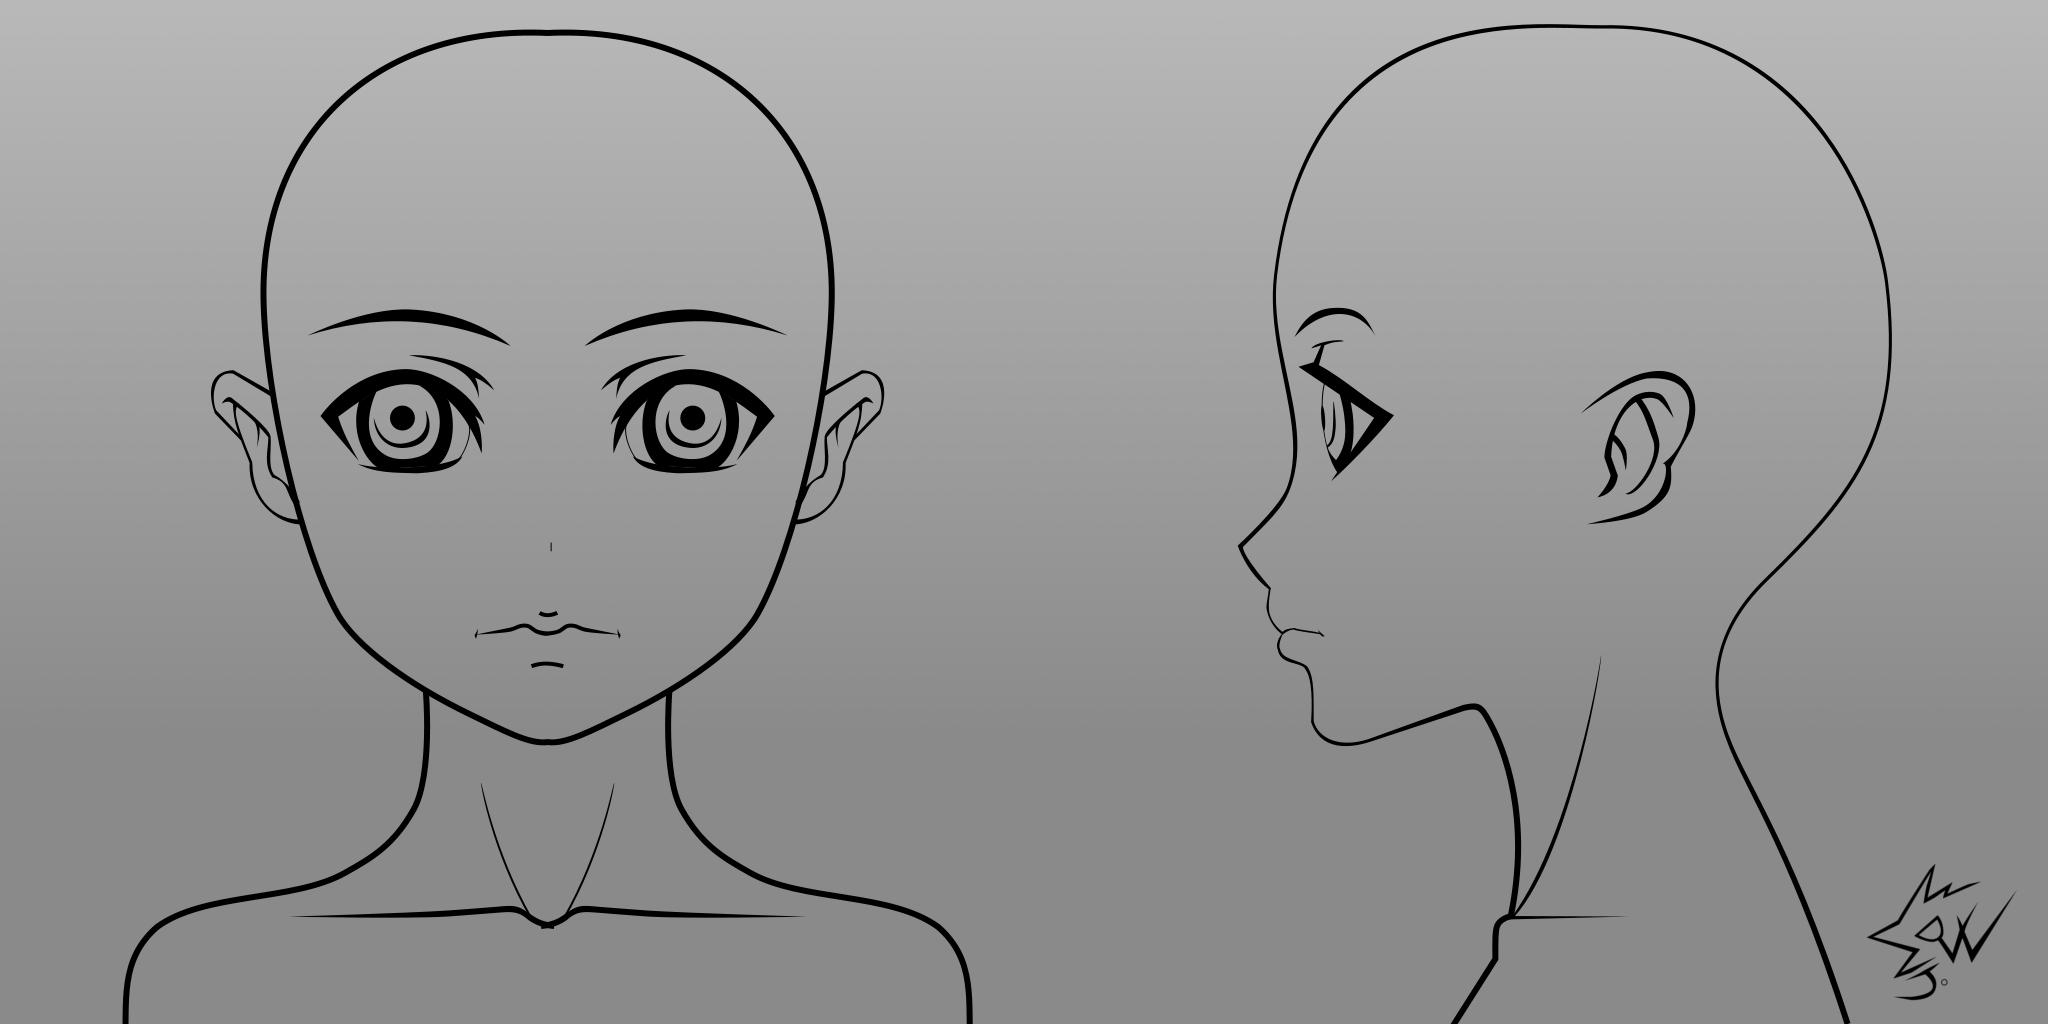 Anime Girl Head Model Sheet 9 by johnnydwicked on DeviantArt